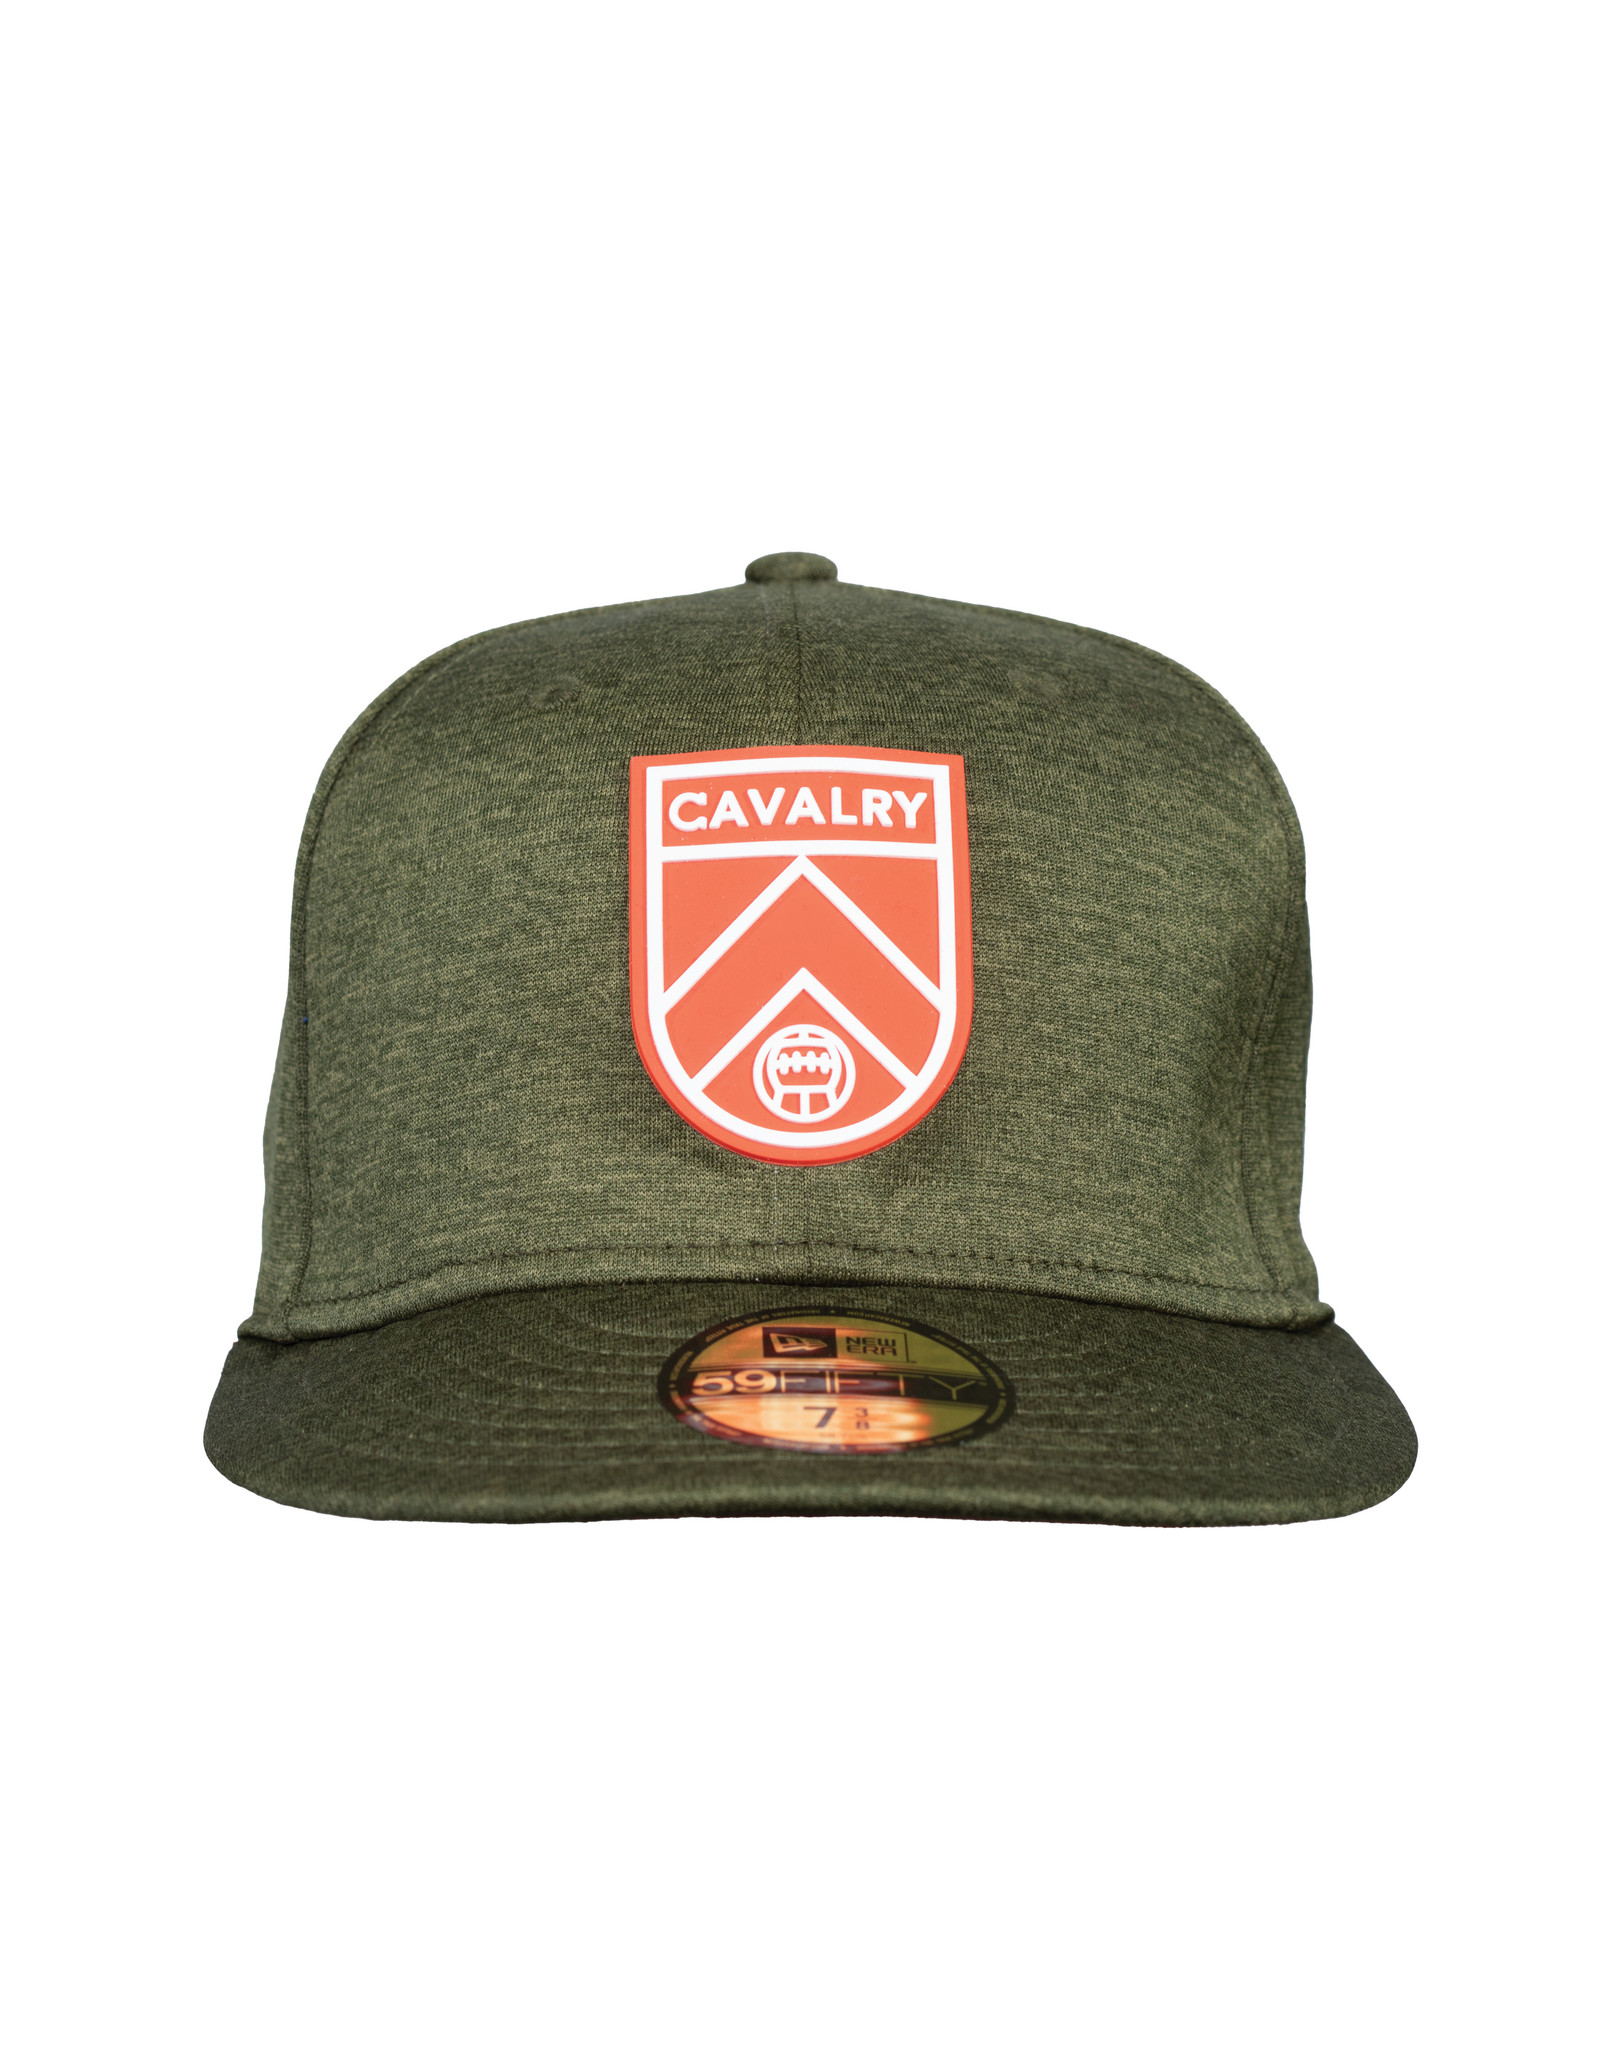 New Era Official Cavalry FC Flat Brim Shadow Tech Cap